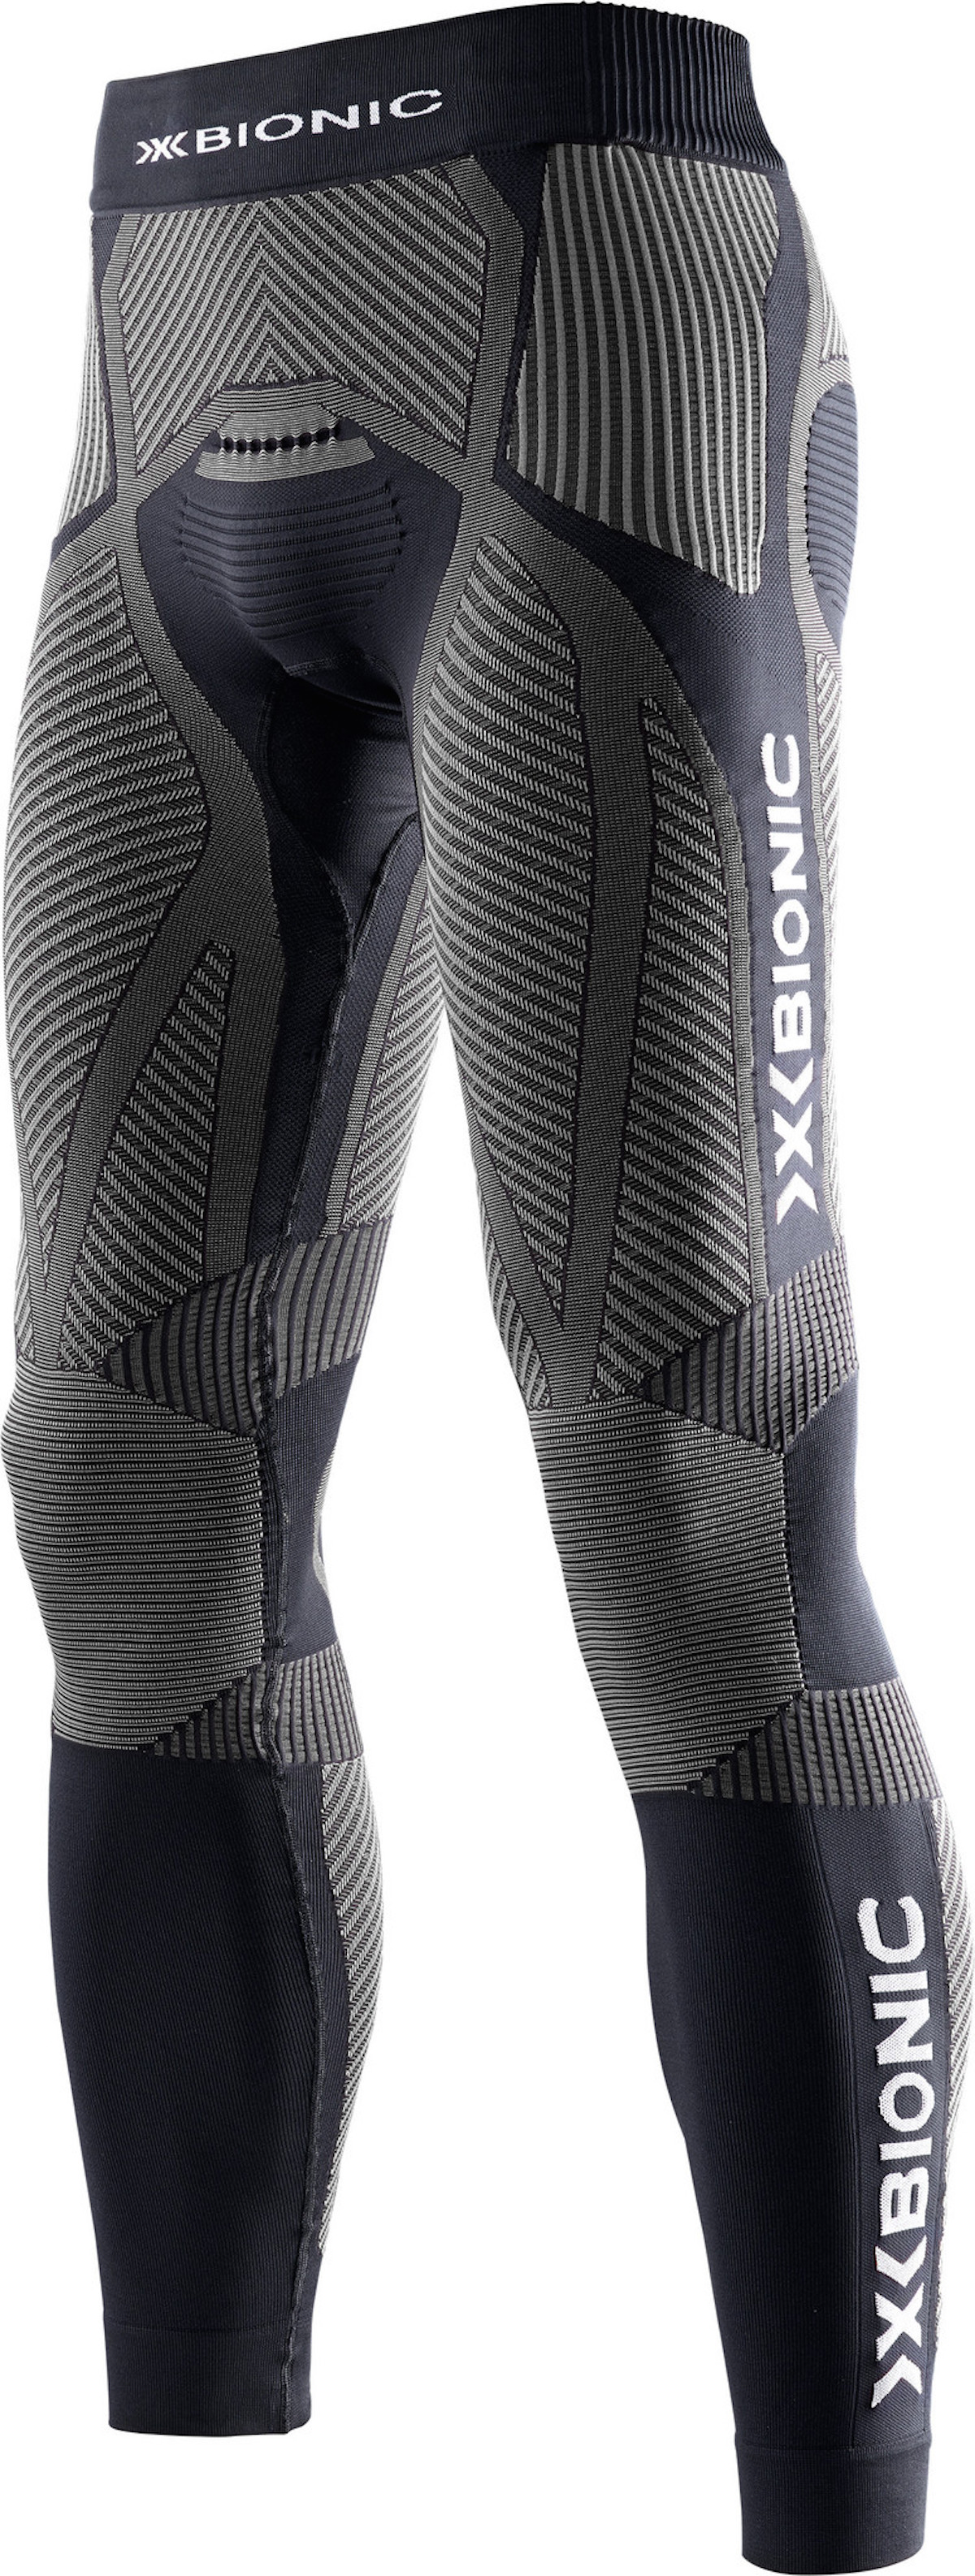 X-Bionic - The Trick Running Pants Long - Mallas de running - Hombre